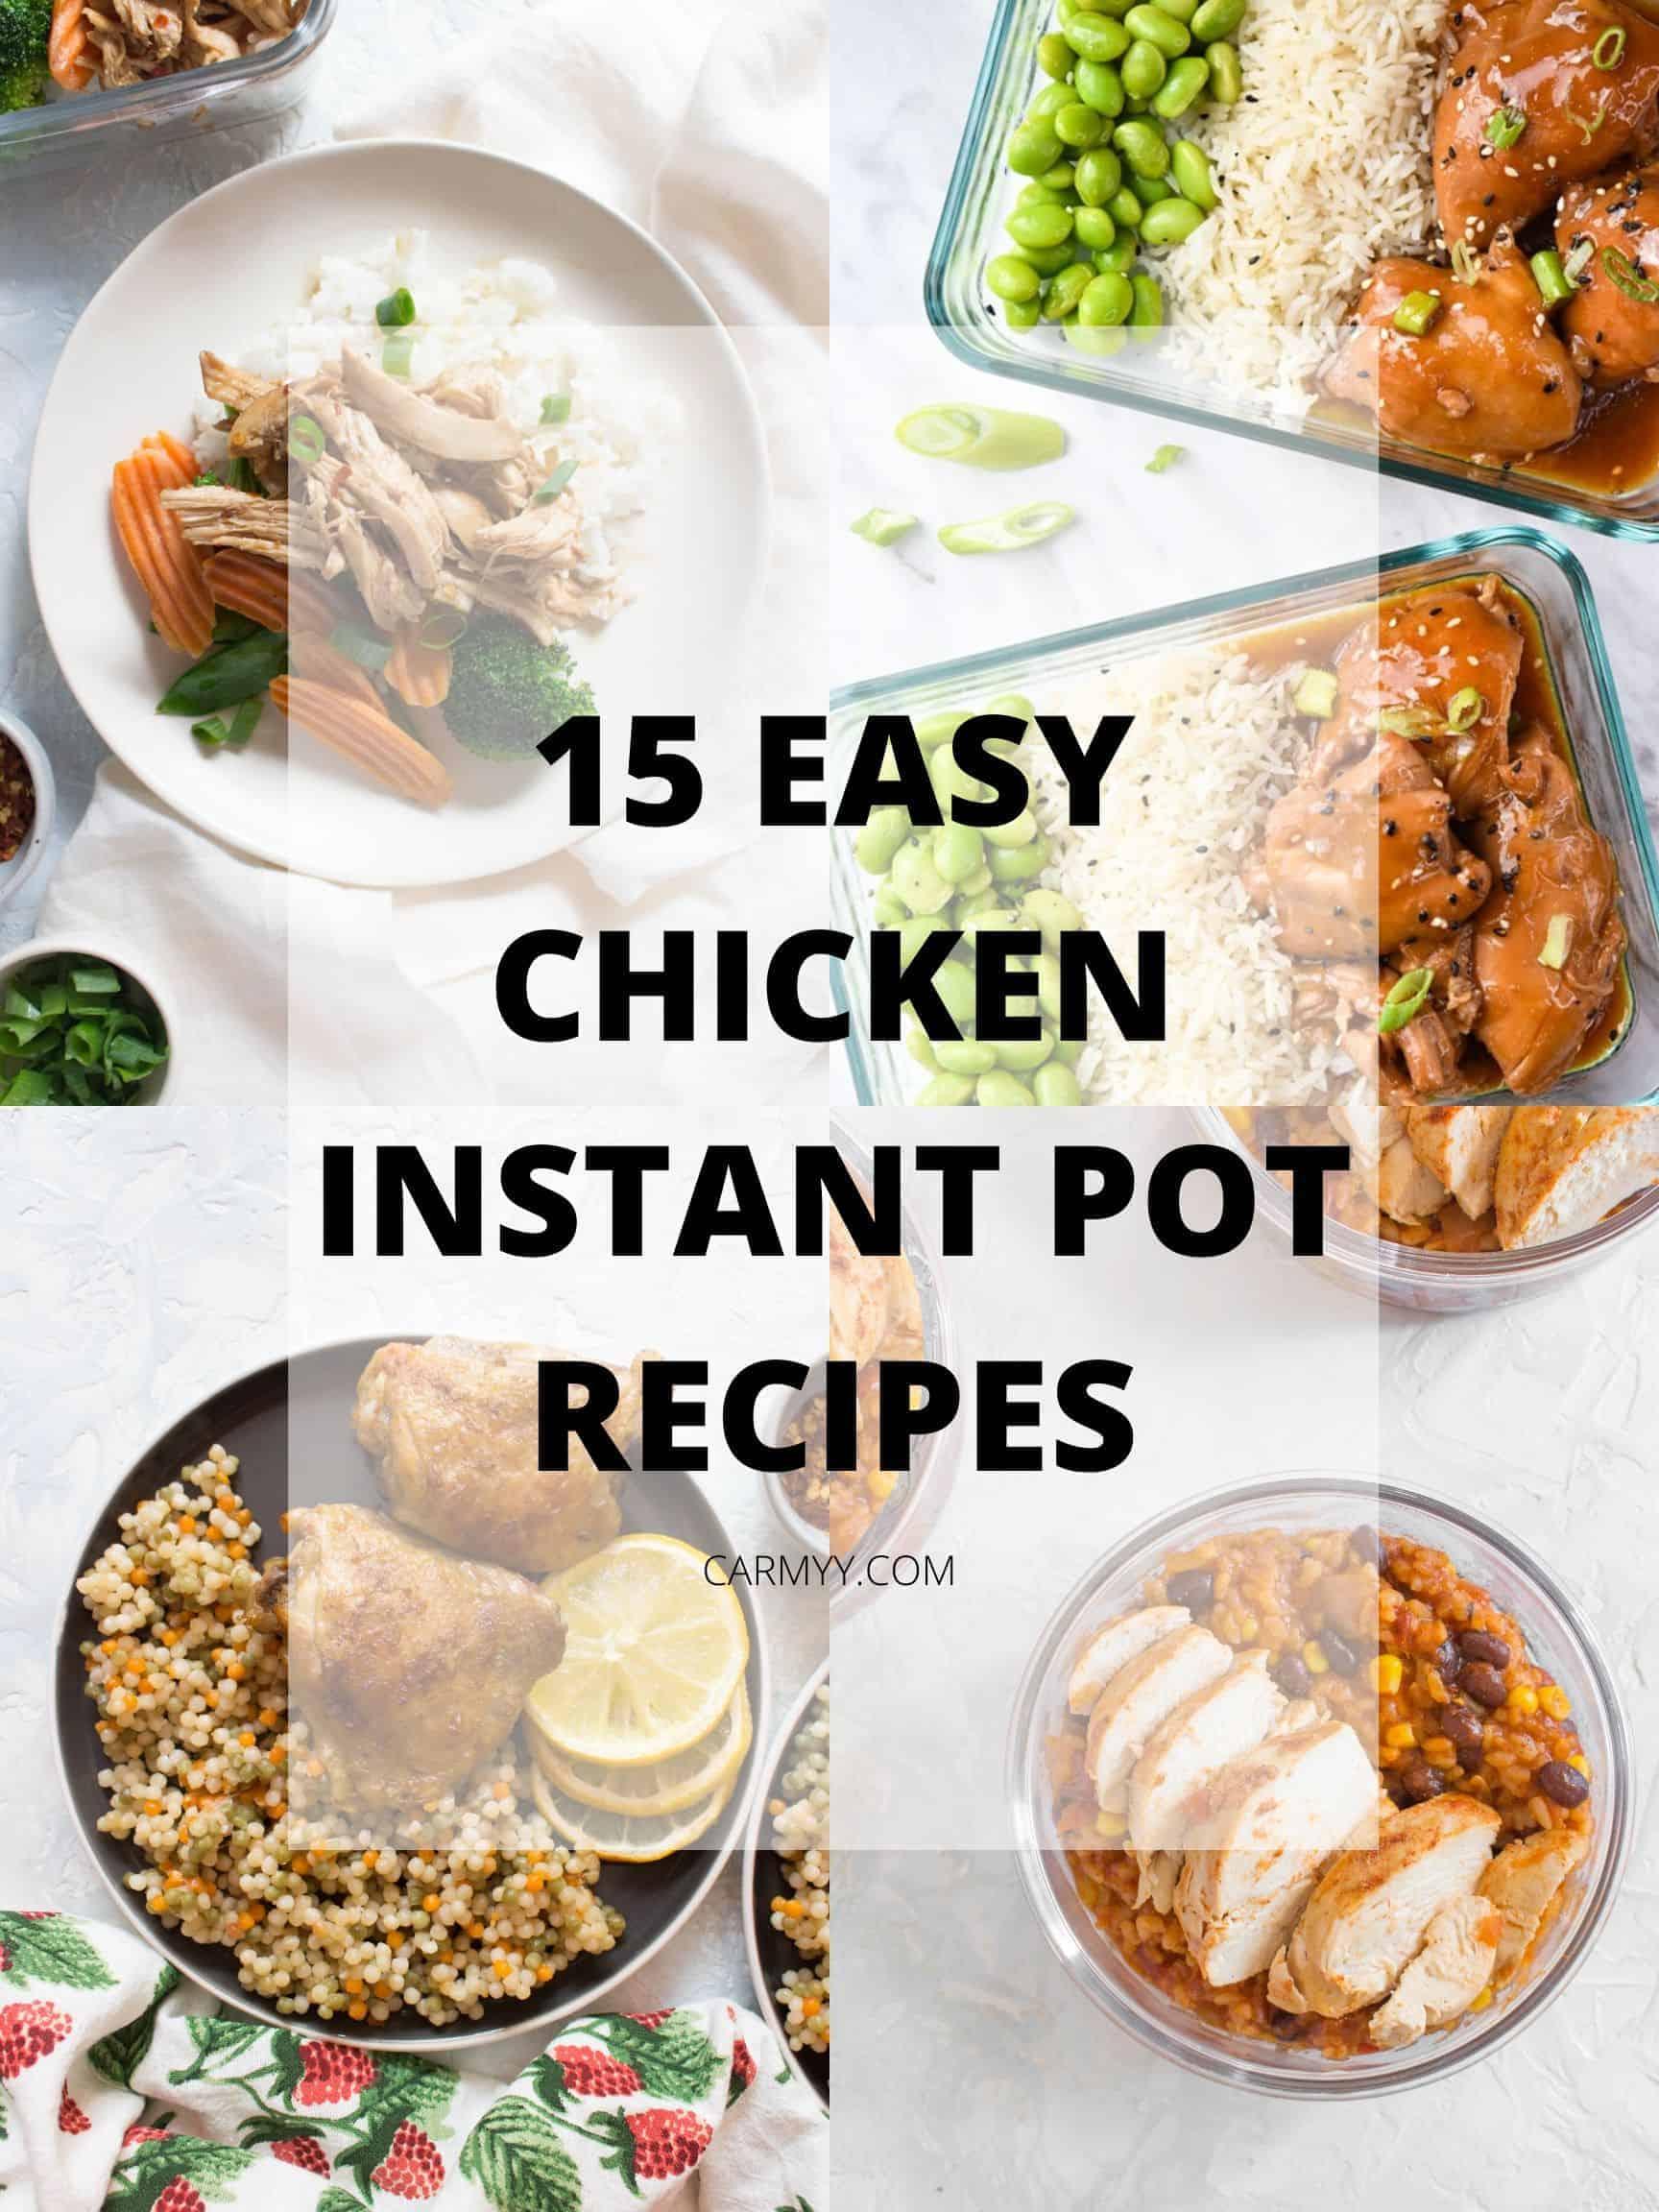 Easy Instant Pot Chicken Recipes Carmy Run Eat Travel